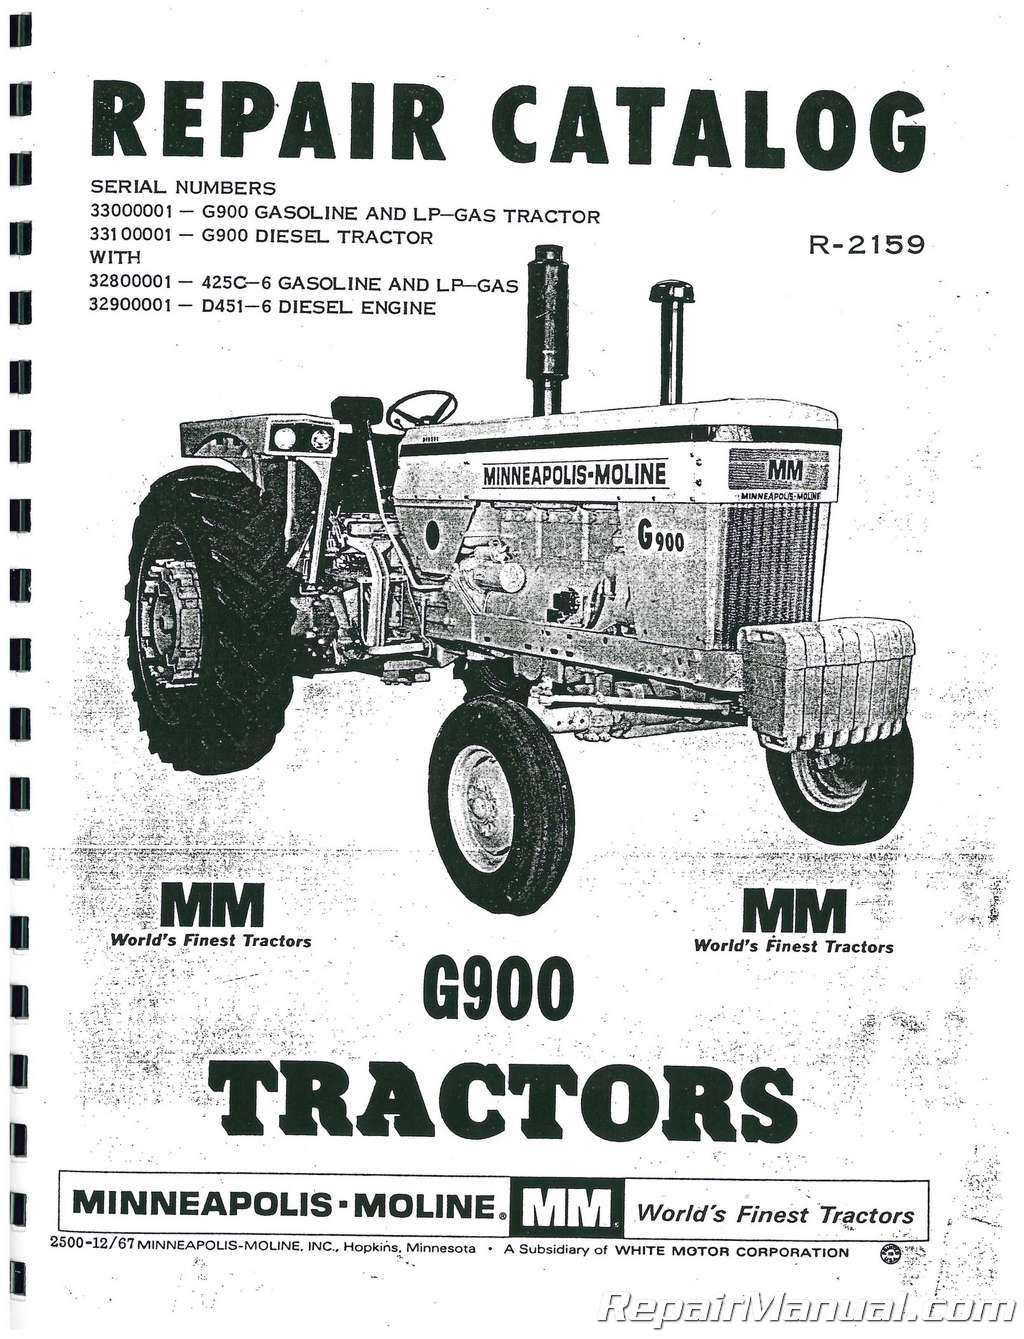 Minneapolis Moline MPLS MOLINE-G-900 Parts Manual